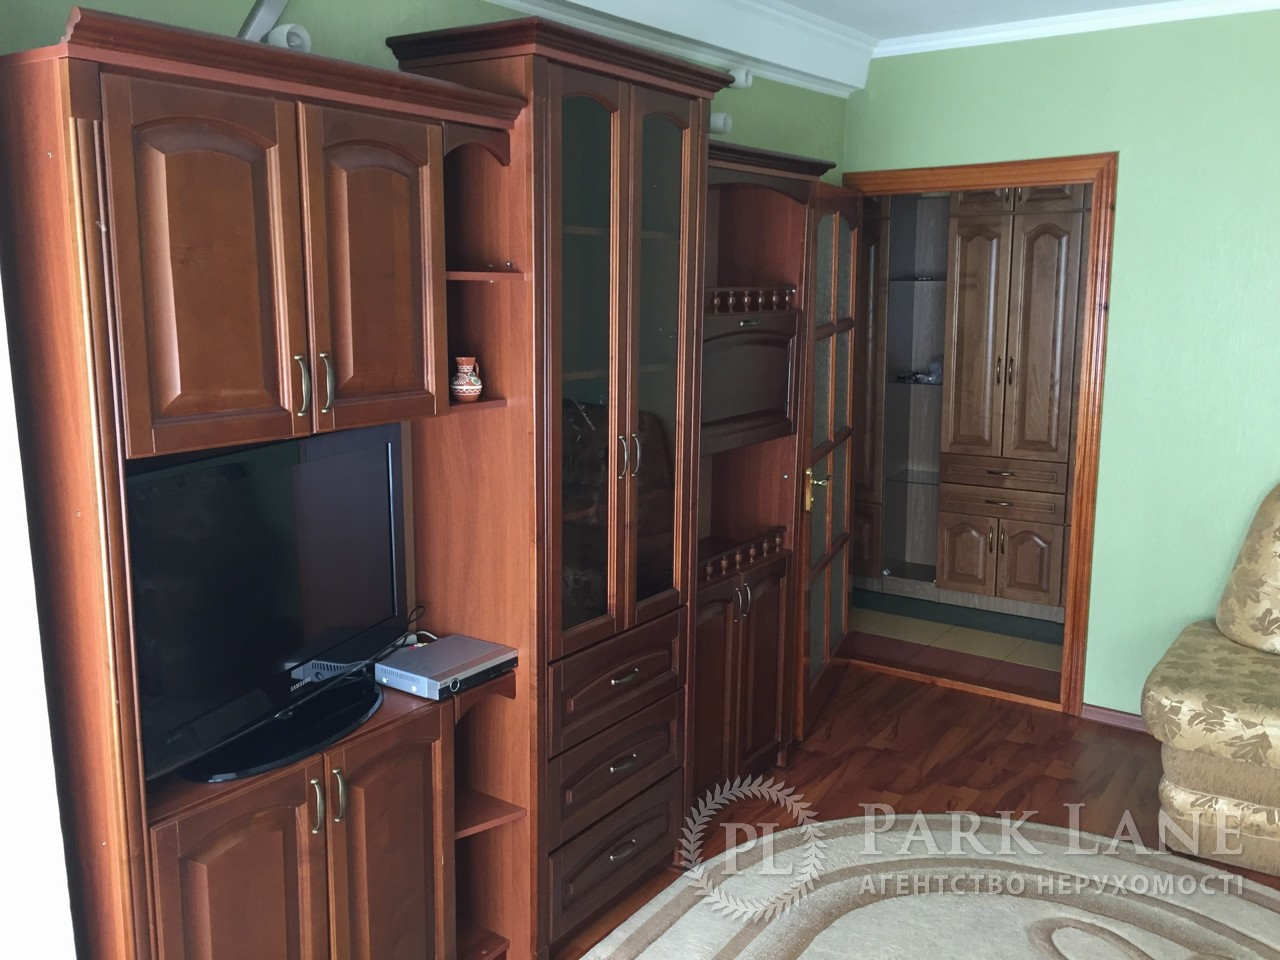 Квартира ул. Ушинского, 26, Киев, K-24971 - Фото 2